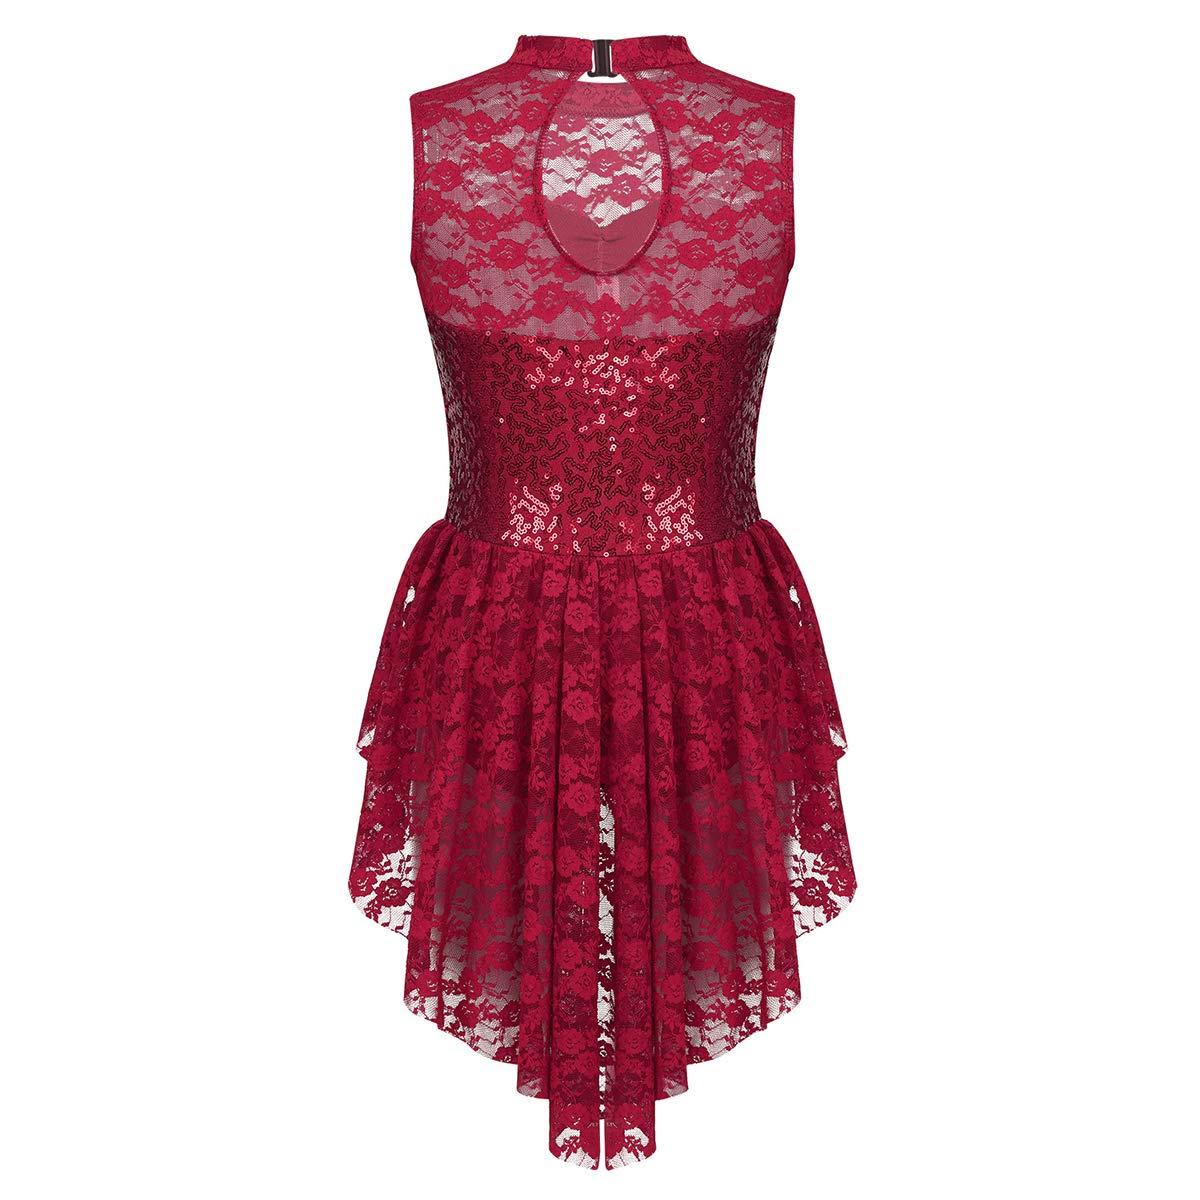 JEATHA Kids Girls Lace Splice Shiny Sequins Keyhole Cutout Back Dress Ice Roller Skating Ballet Dance Leotard Dancewear